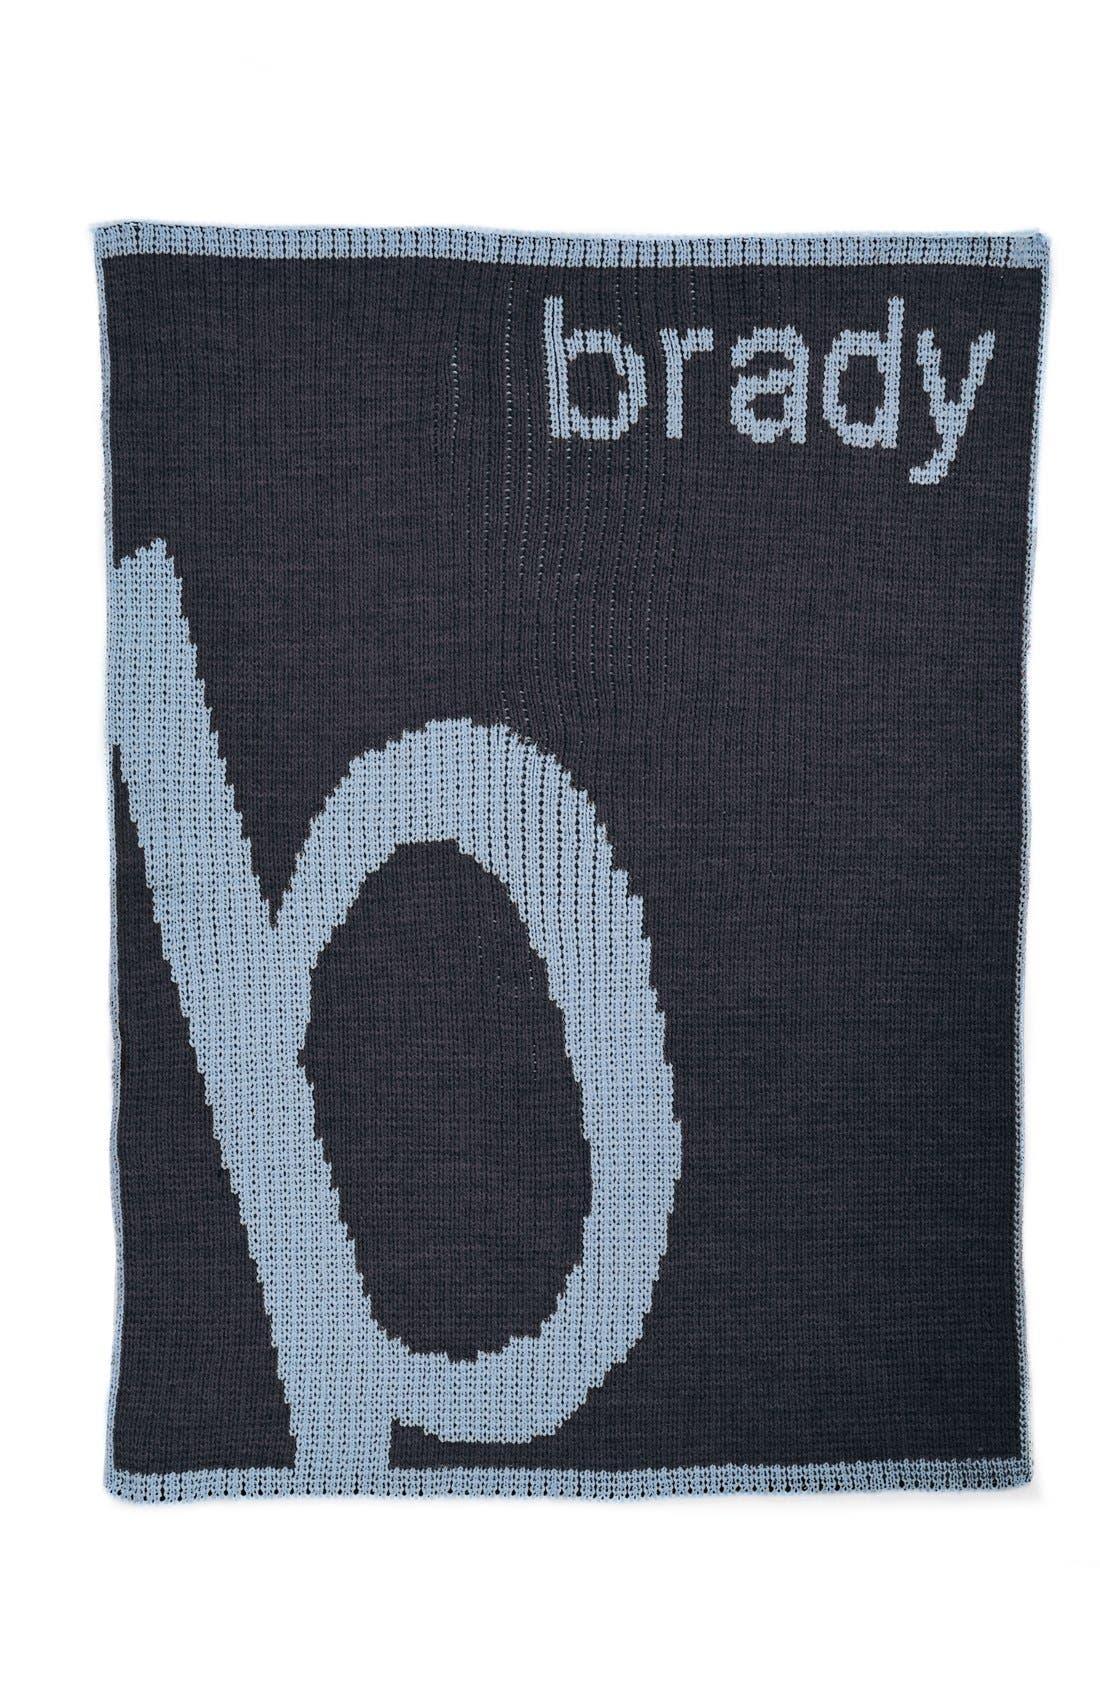 Main Image - Butterscotch Blankees 'Slanted Letter' Personalized Stroller Blanket